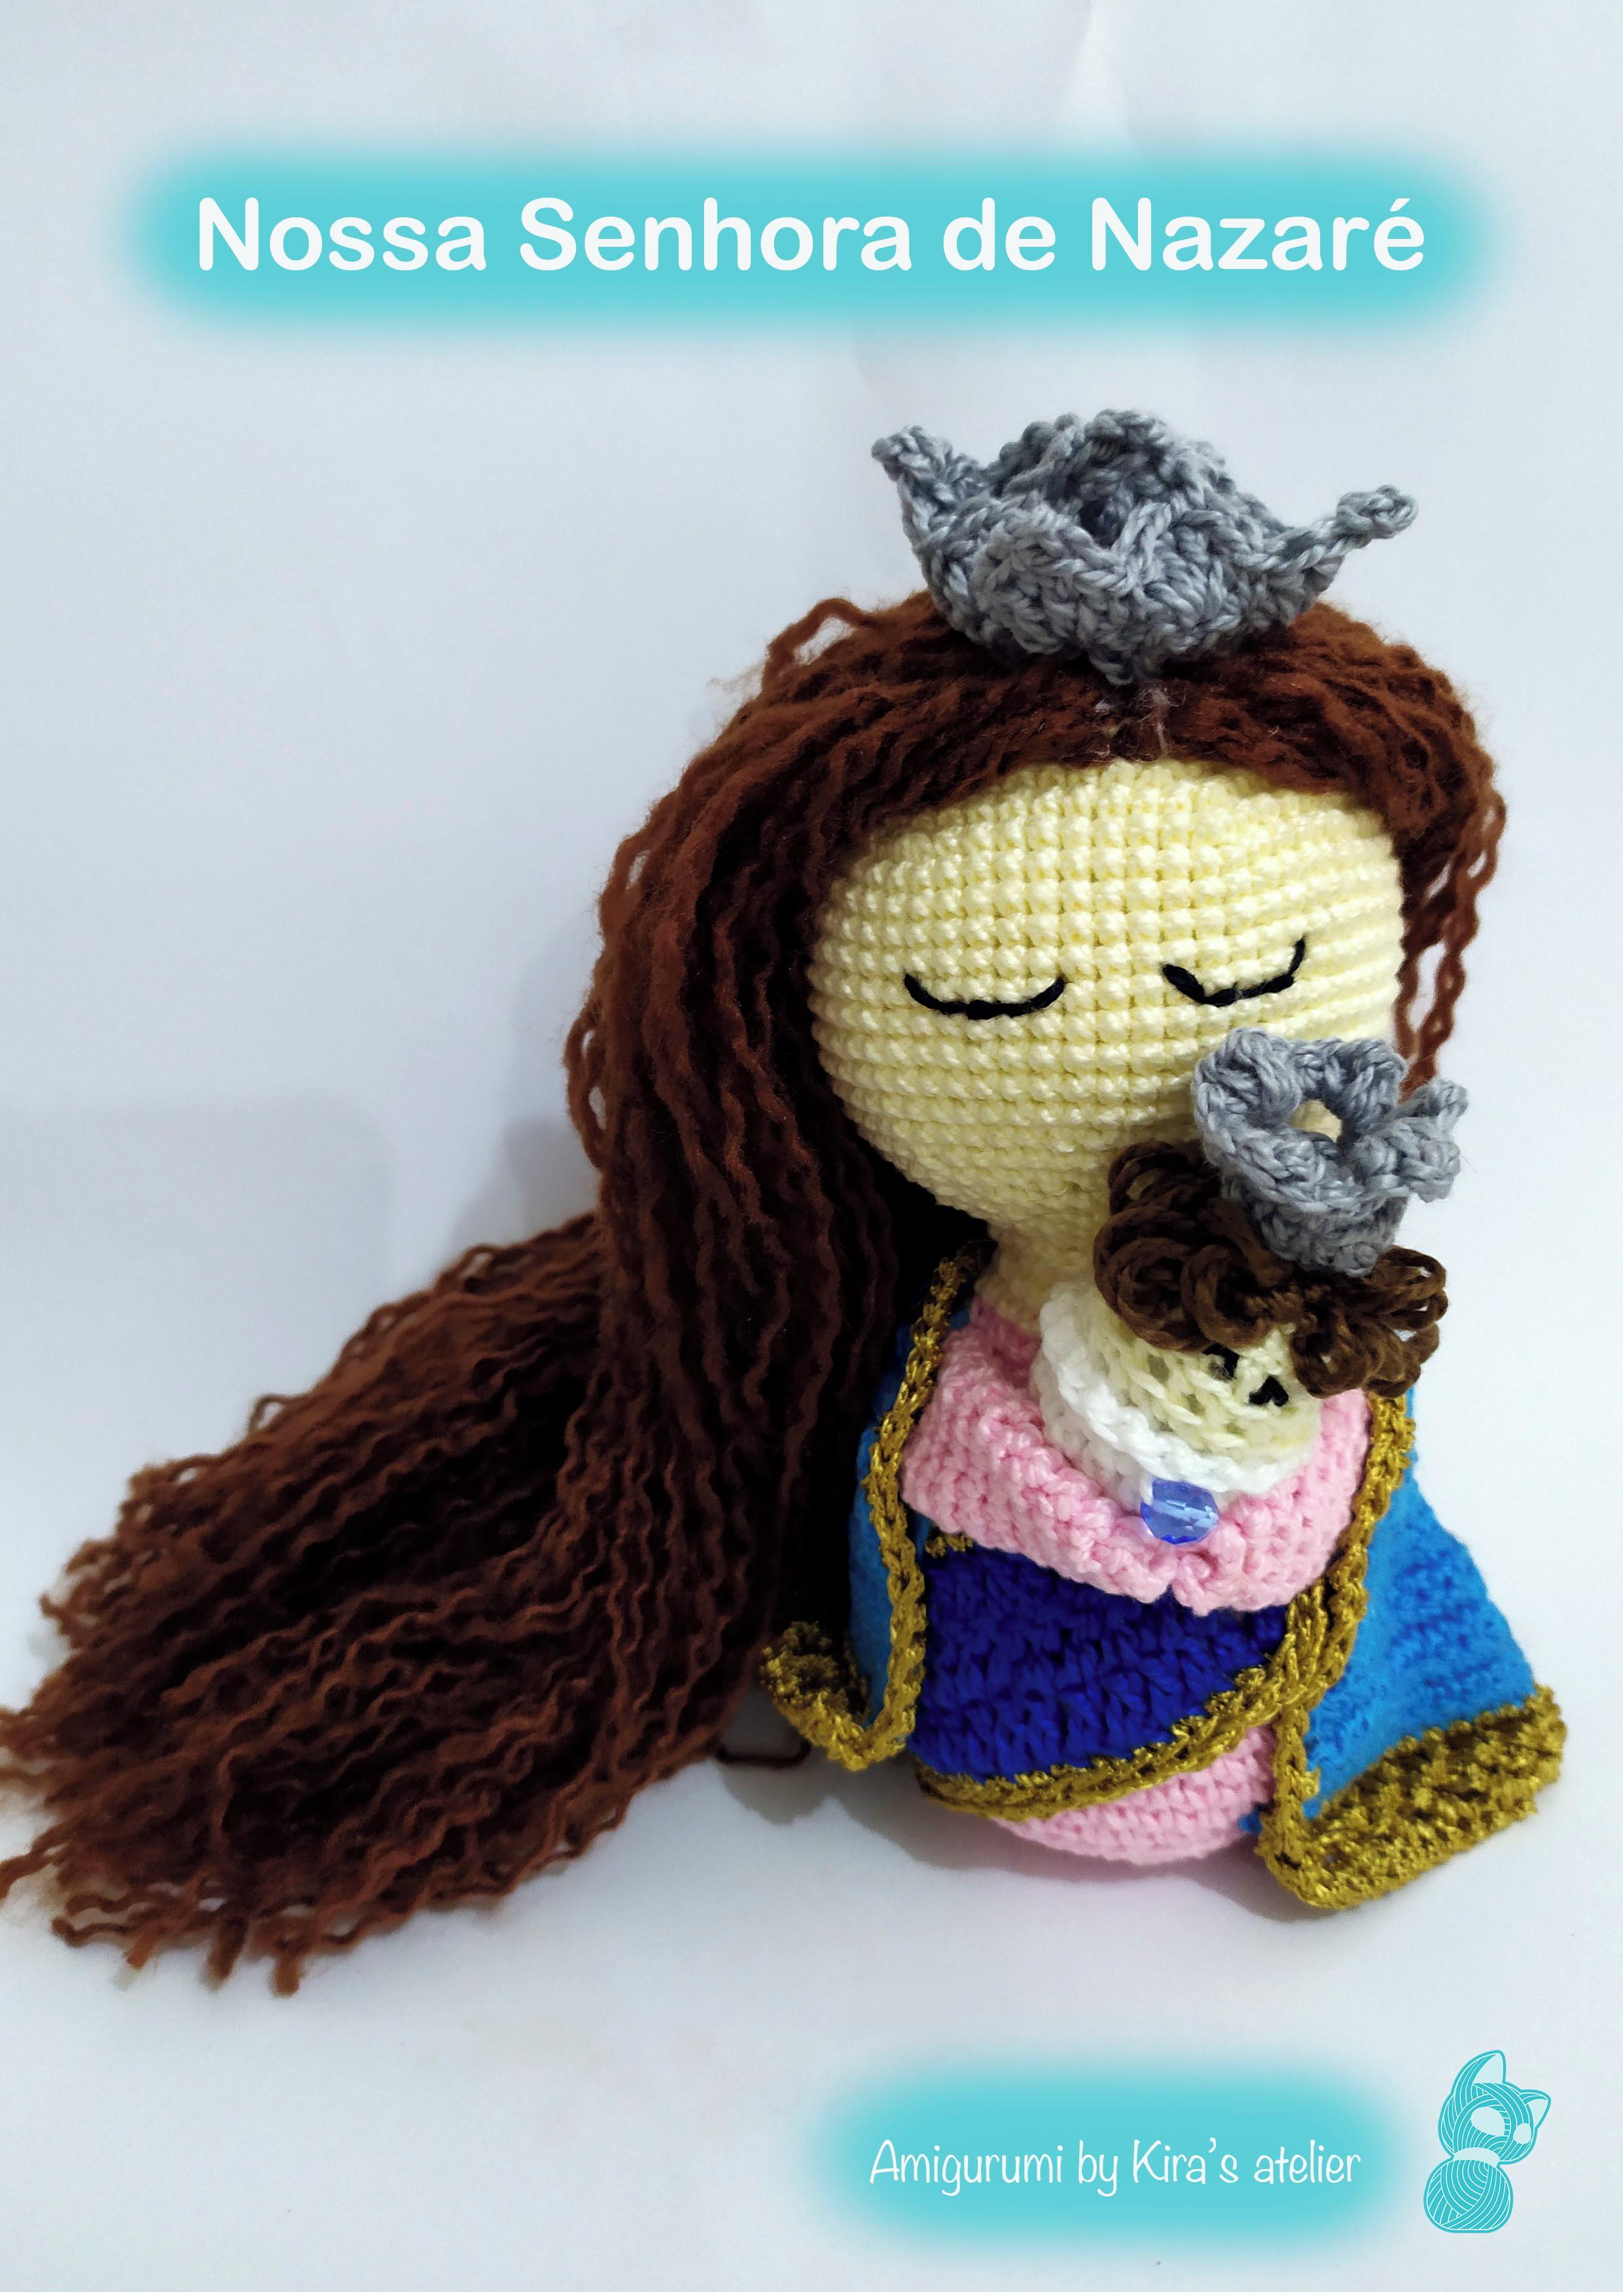 amigurumi passo a passo # 7 bonecos de croche com graficos - YouTube | 3508x2480